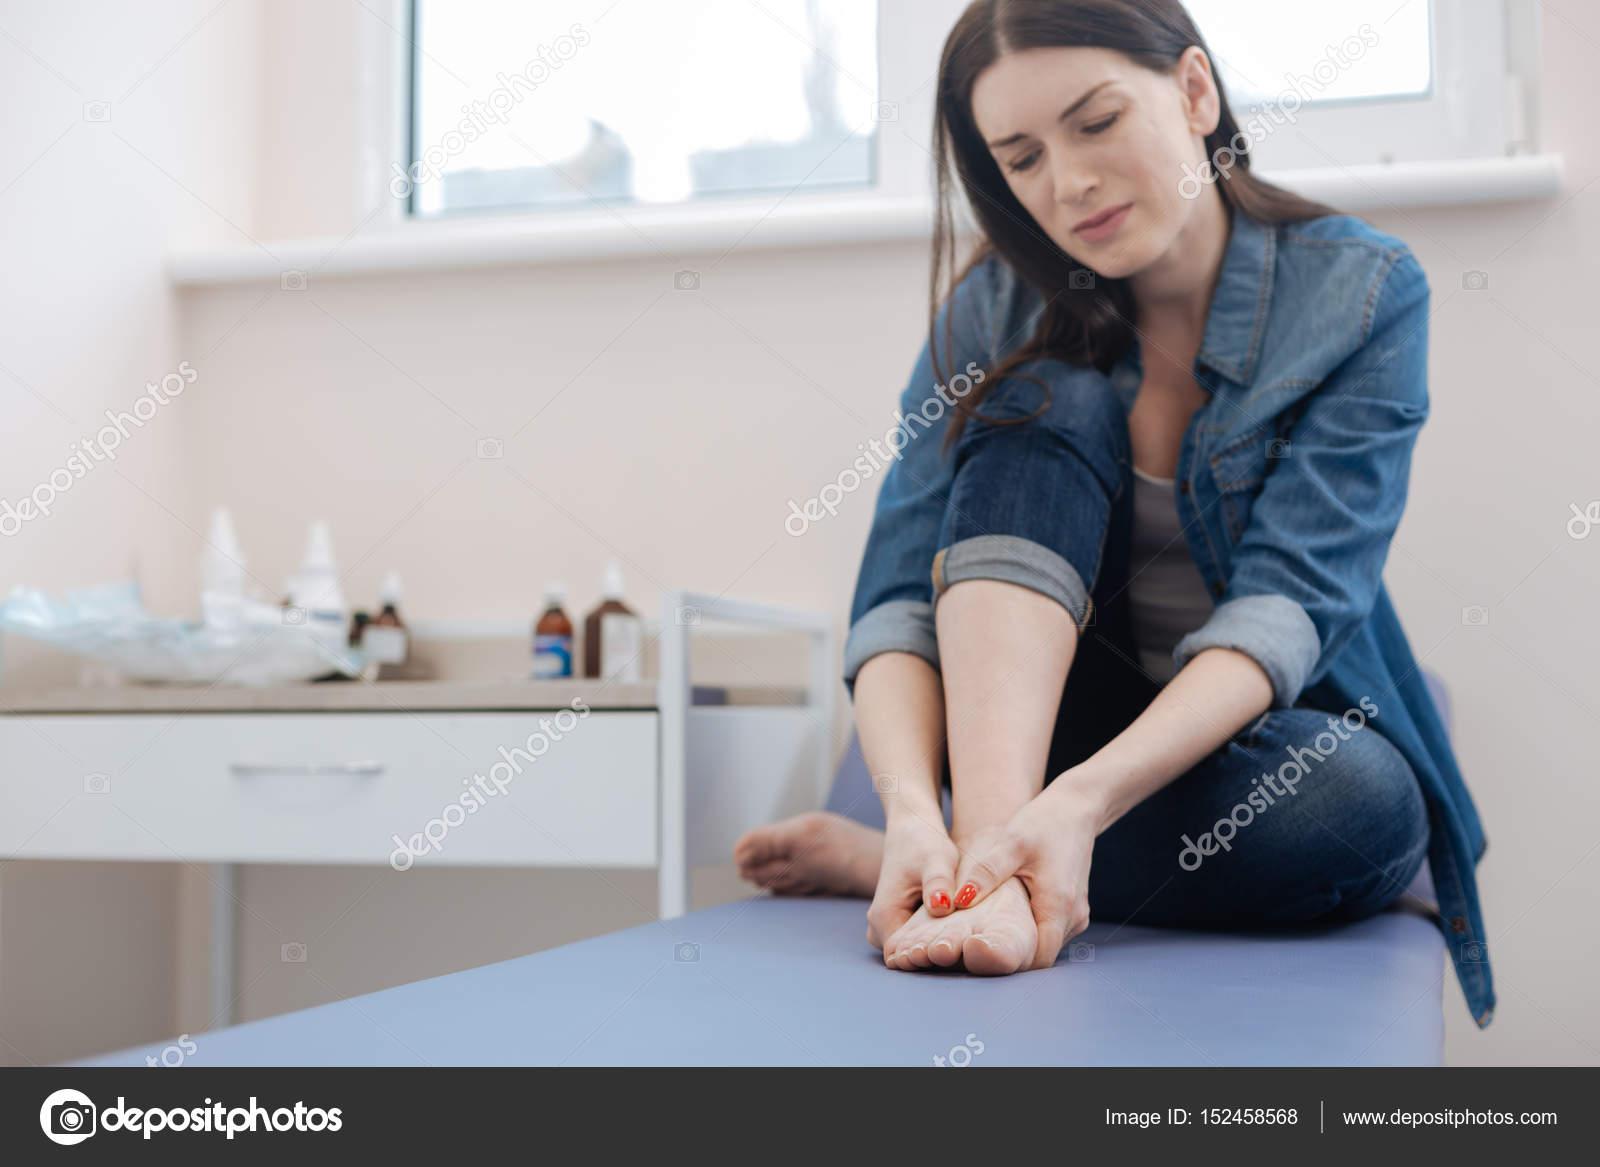 Holding feet girls their